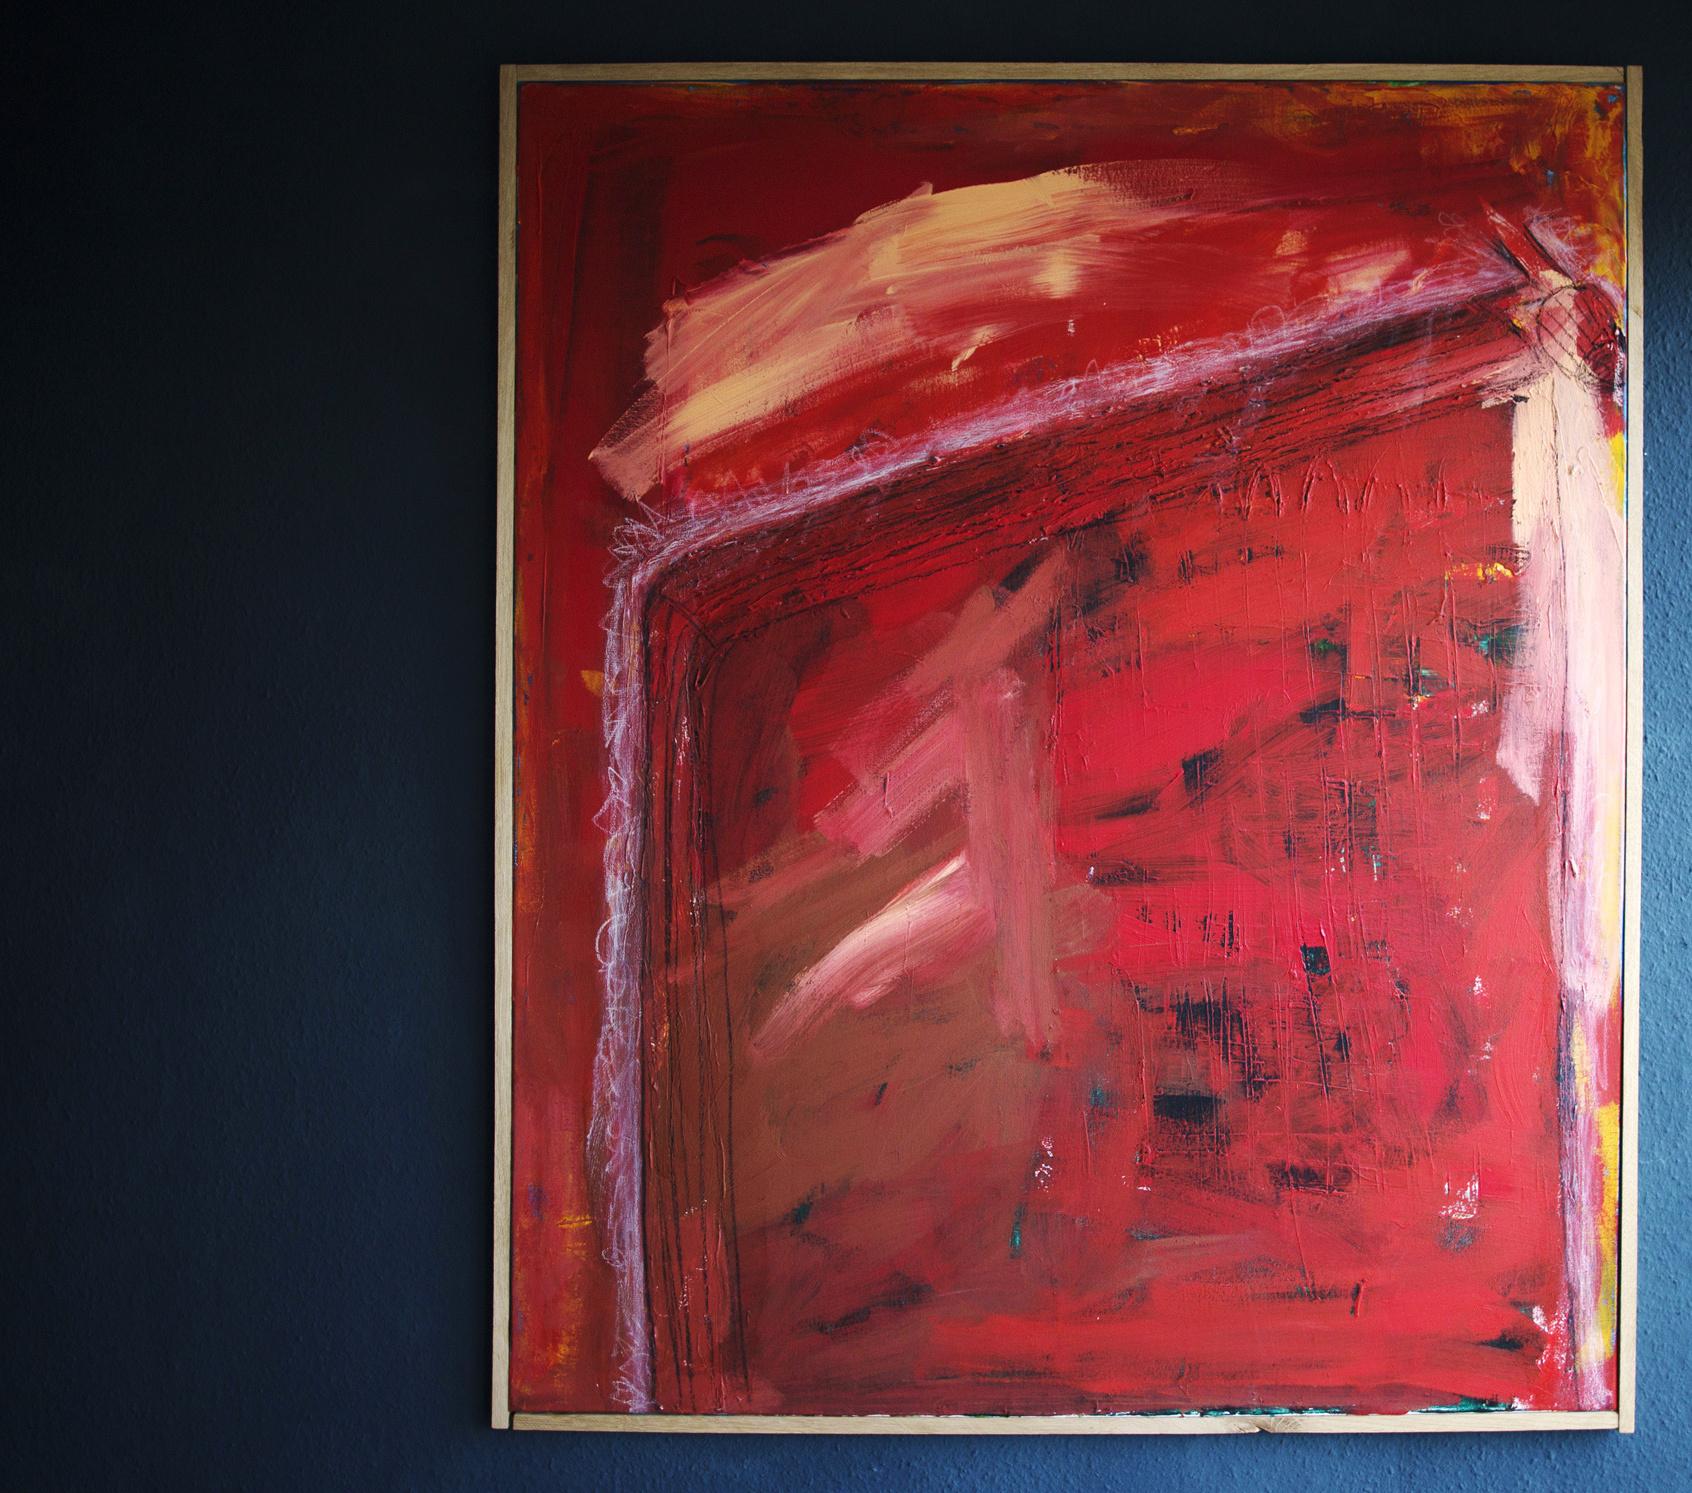 Heizung, Acryl auf Leinwand, 100 x 120 cm •